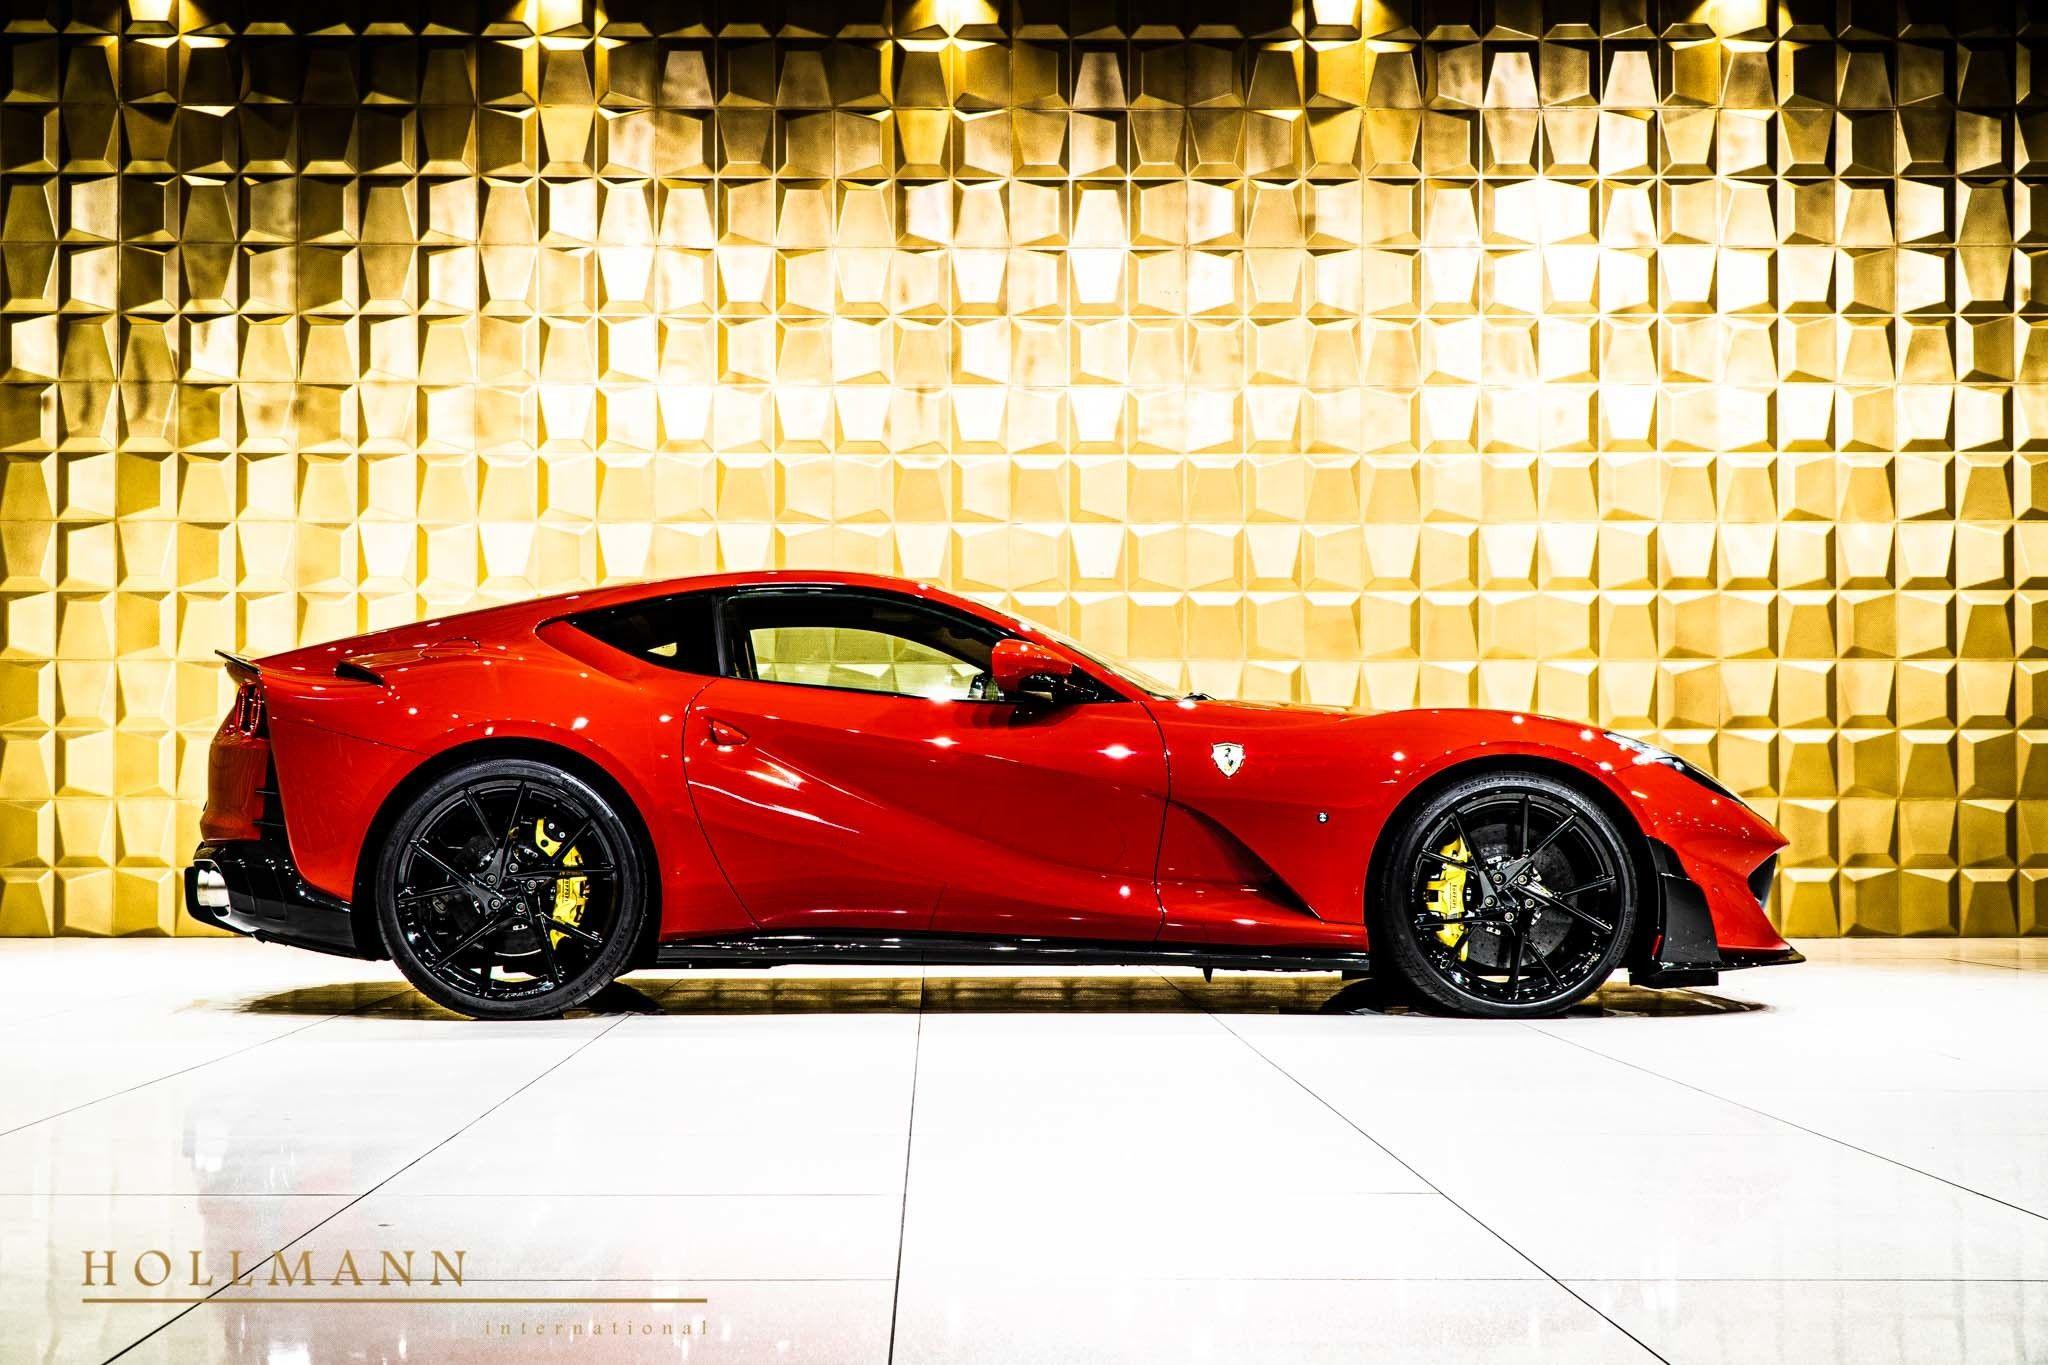 Ferrari 812 Superfast By Mansory Hollmann International Germany For Sale On Luxurypulse In 2020 Luxury Cars For Sale Ferrari Used Luxury Cars